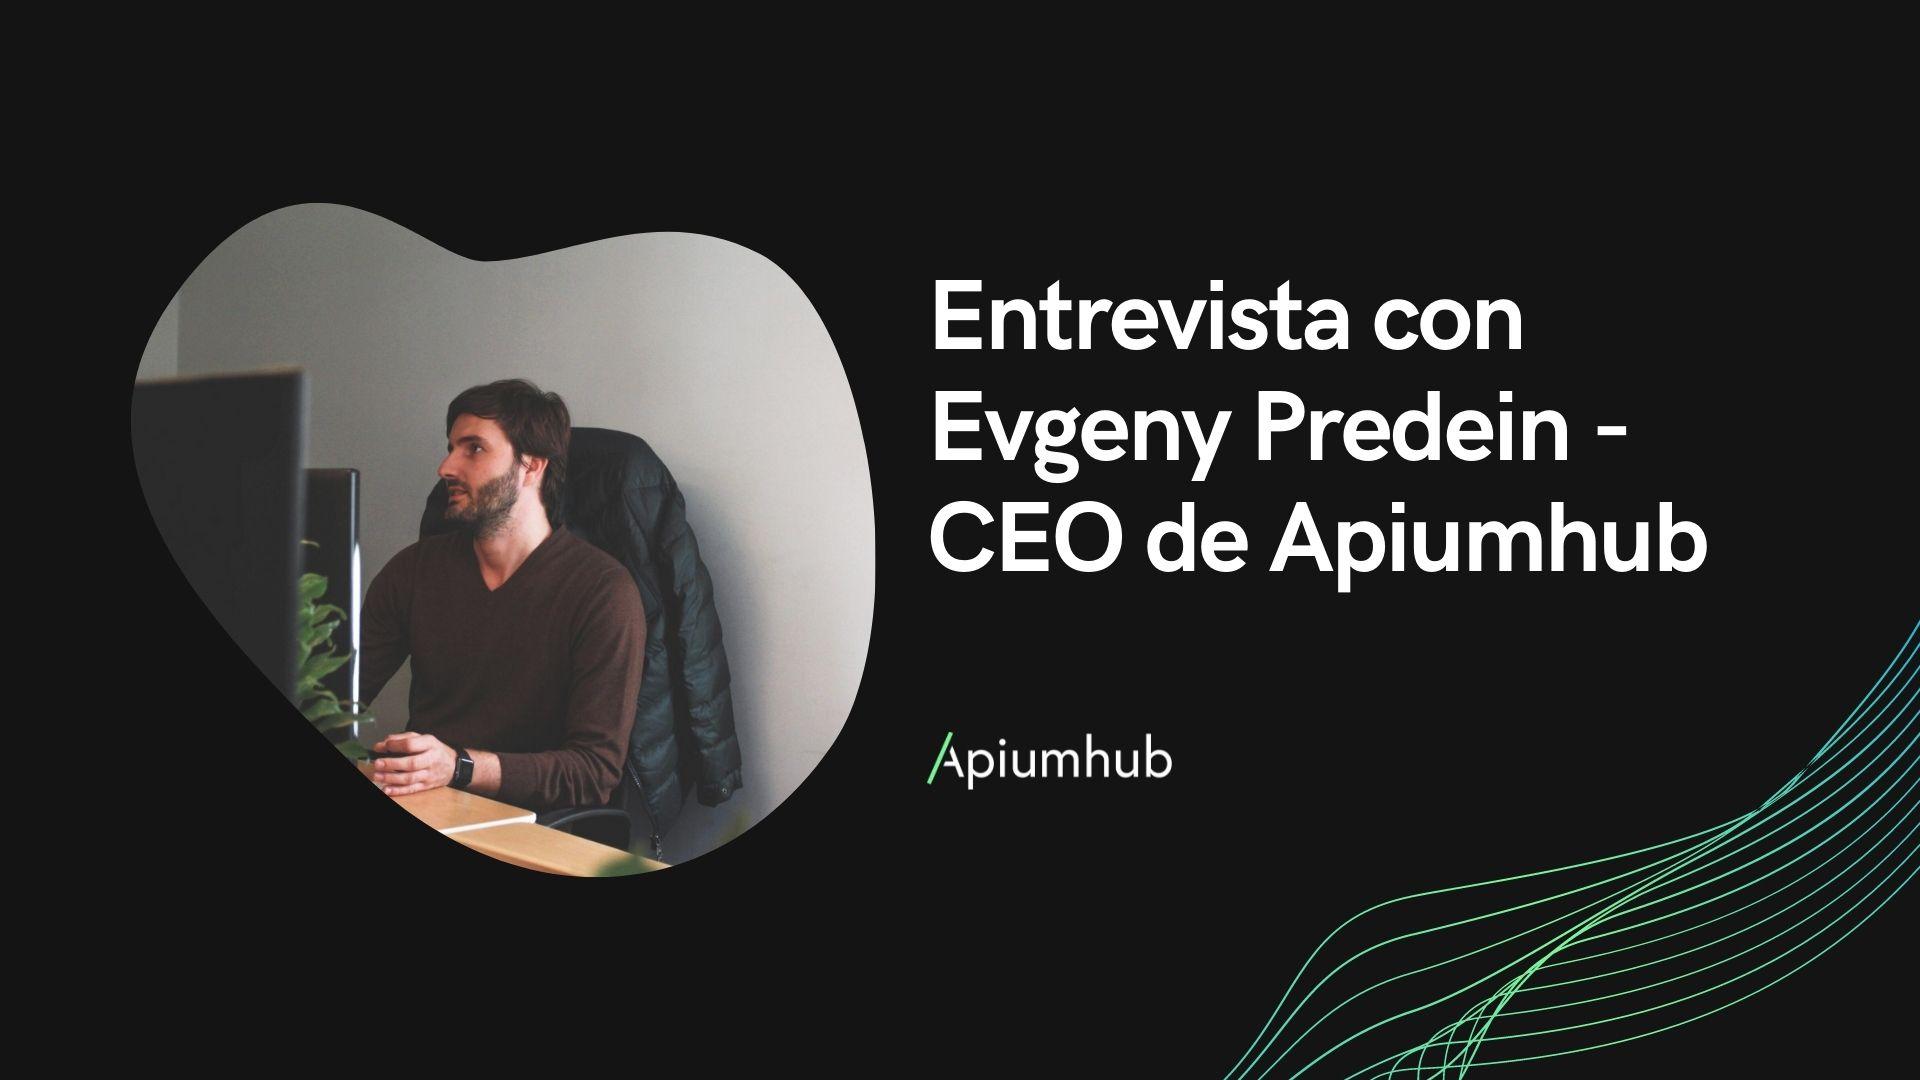 Entrevista con Evgeny Predein - CEO de Apiumhub